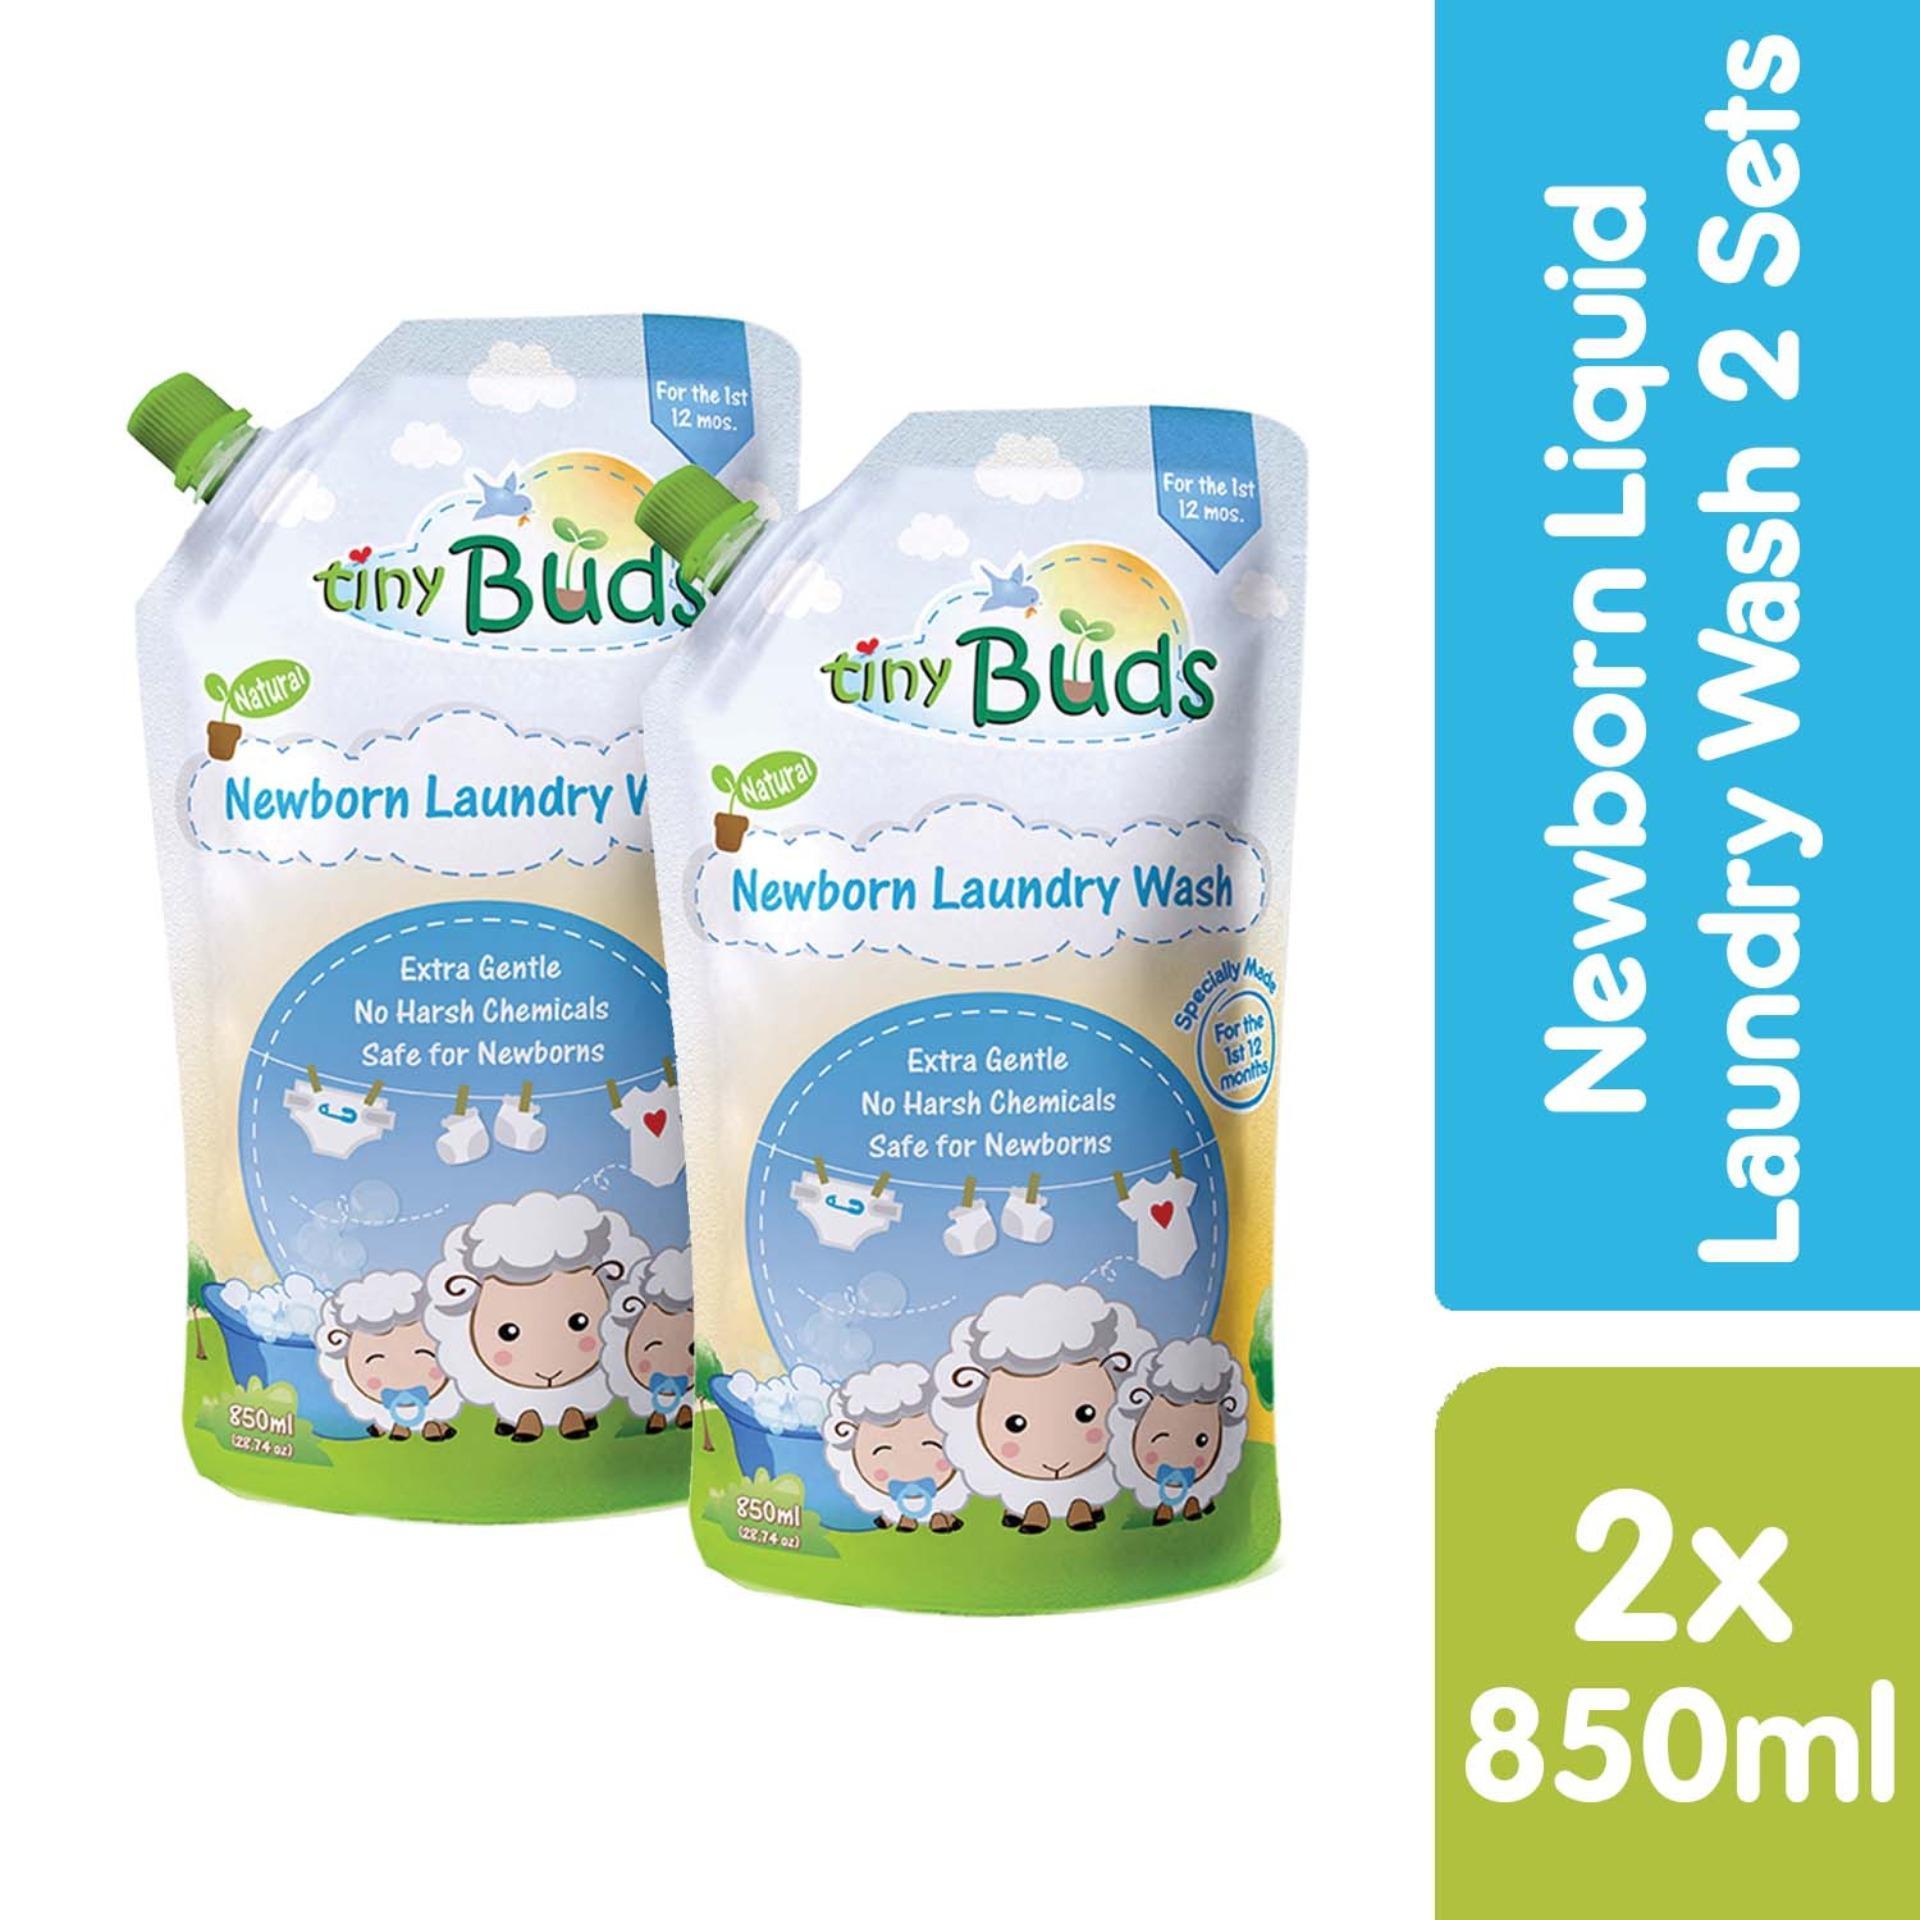 Baby Detergent for sale Baby Washing Powder online brands prices